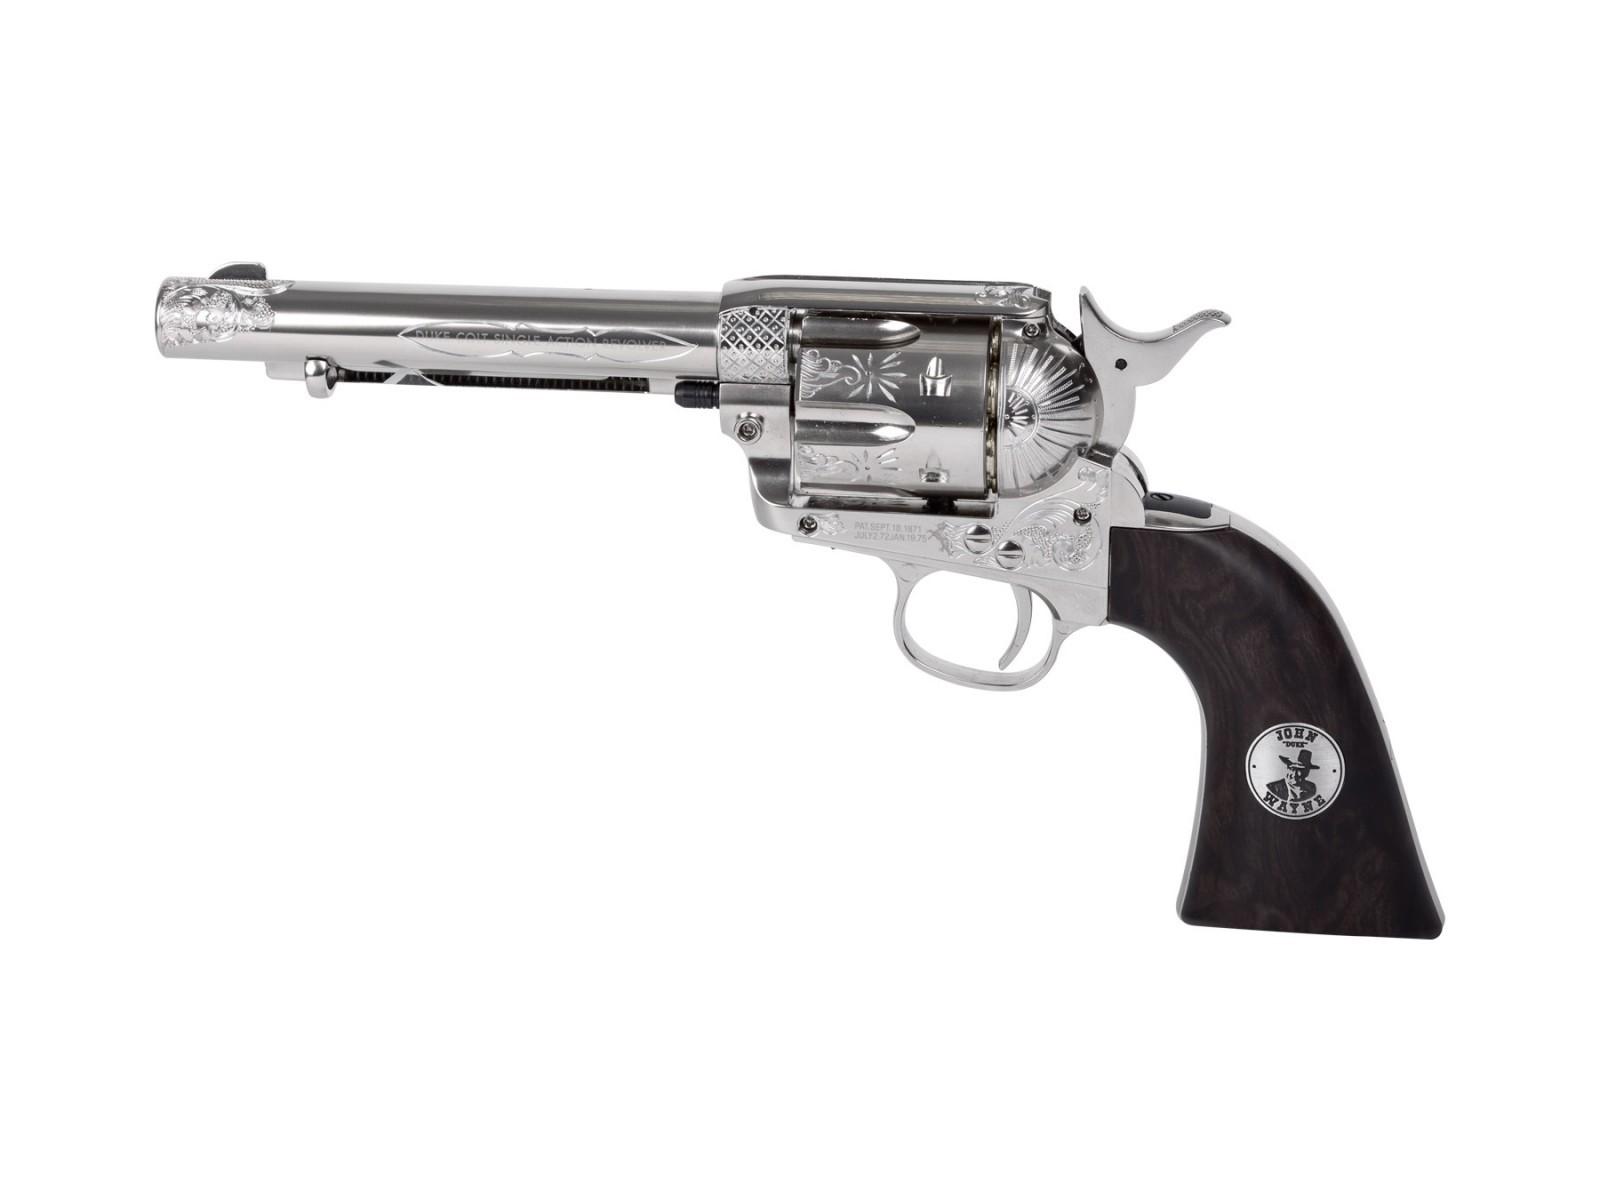 Duke SAA Colt.